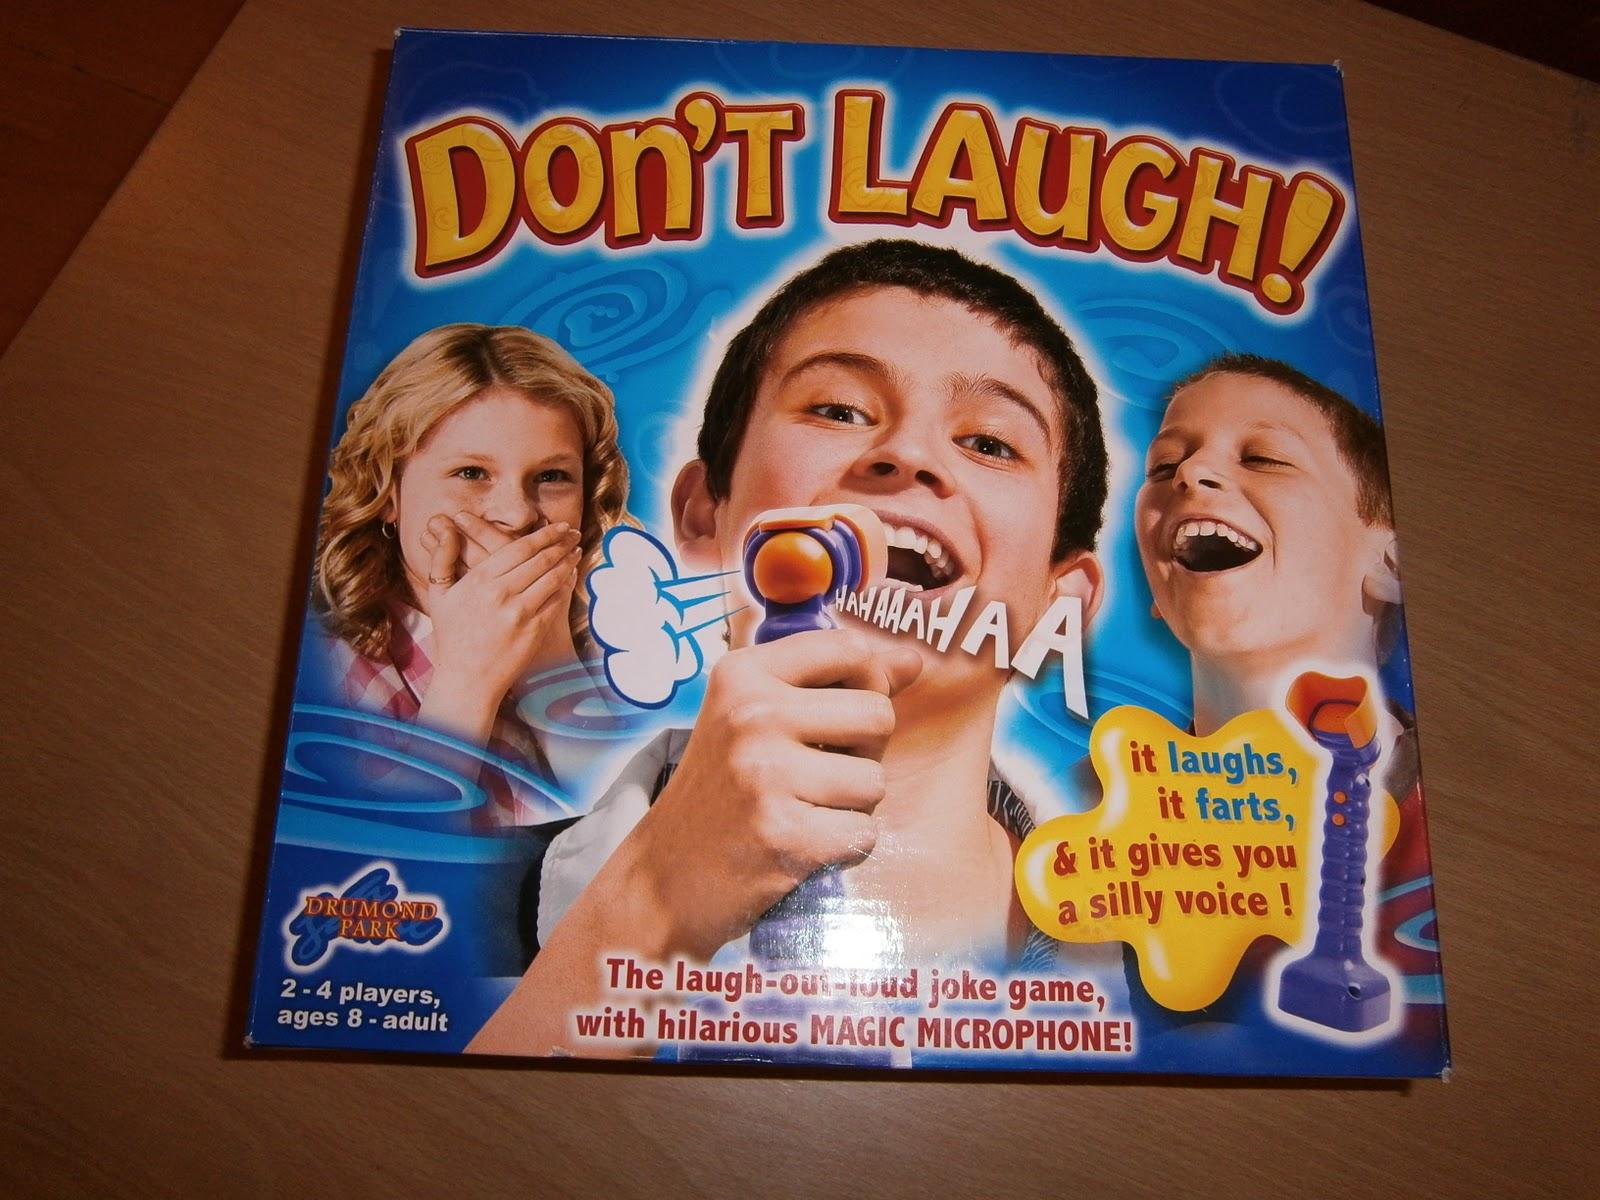 Co Znaczy Dont Laugh